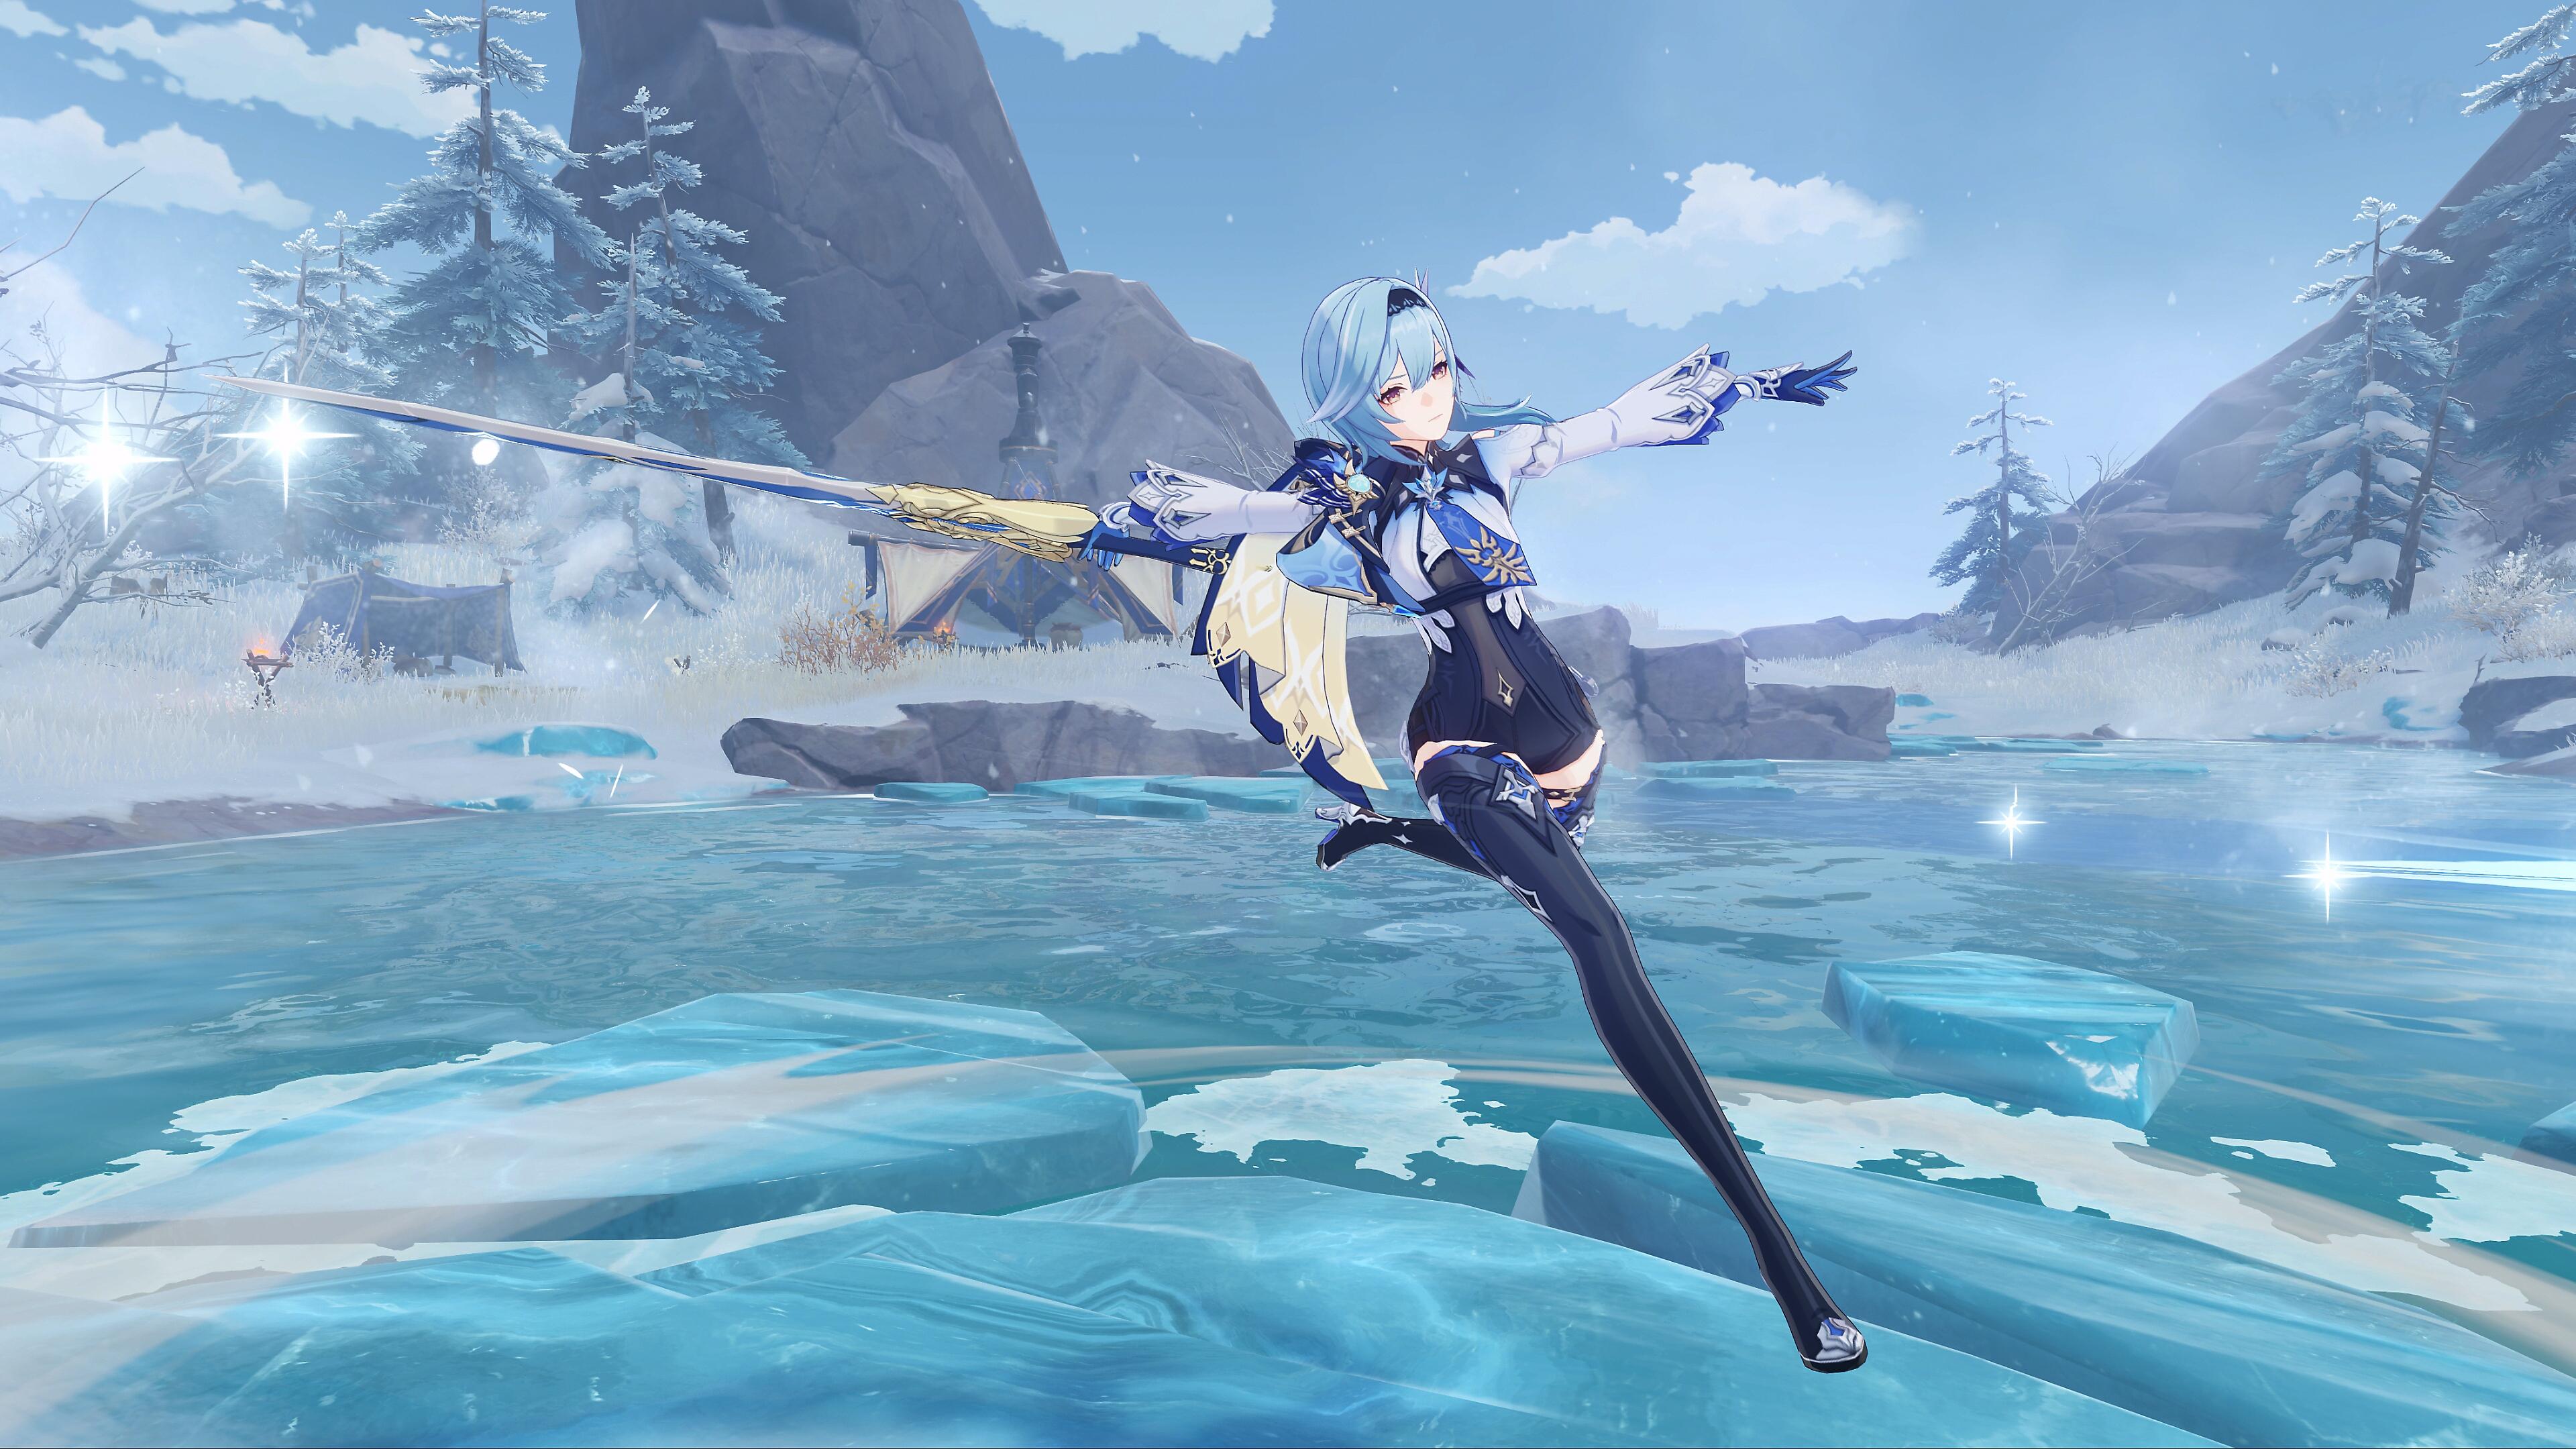 Genshin Impact – снимок экрана